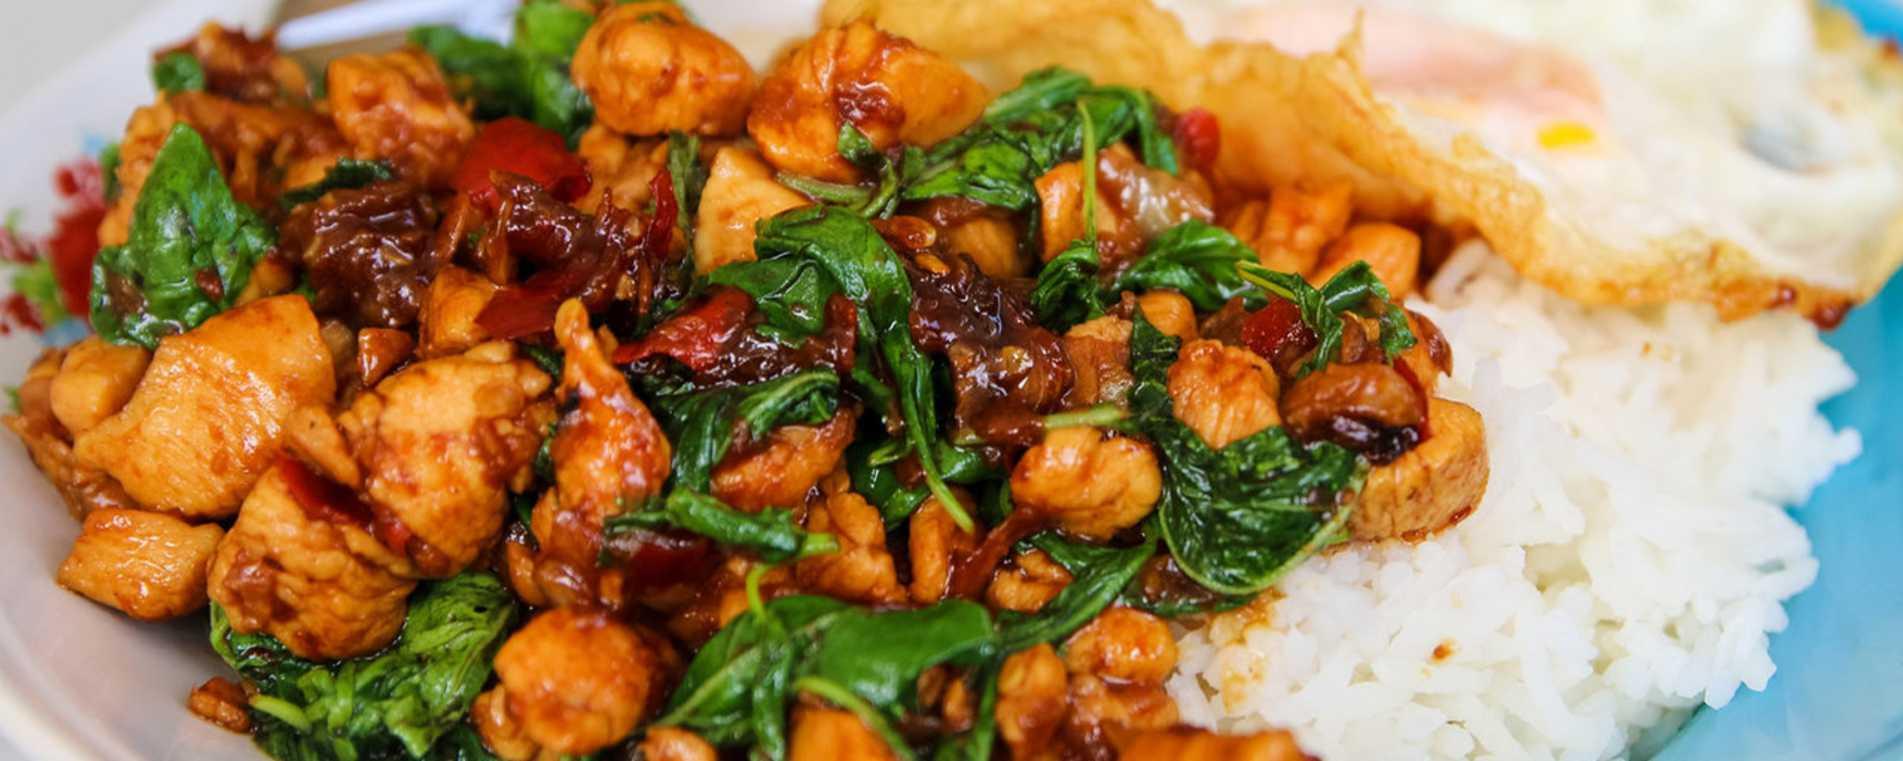 Bangkok Chef Restaurant - Temecula